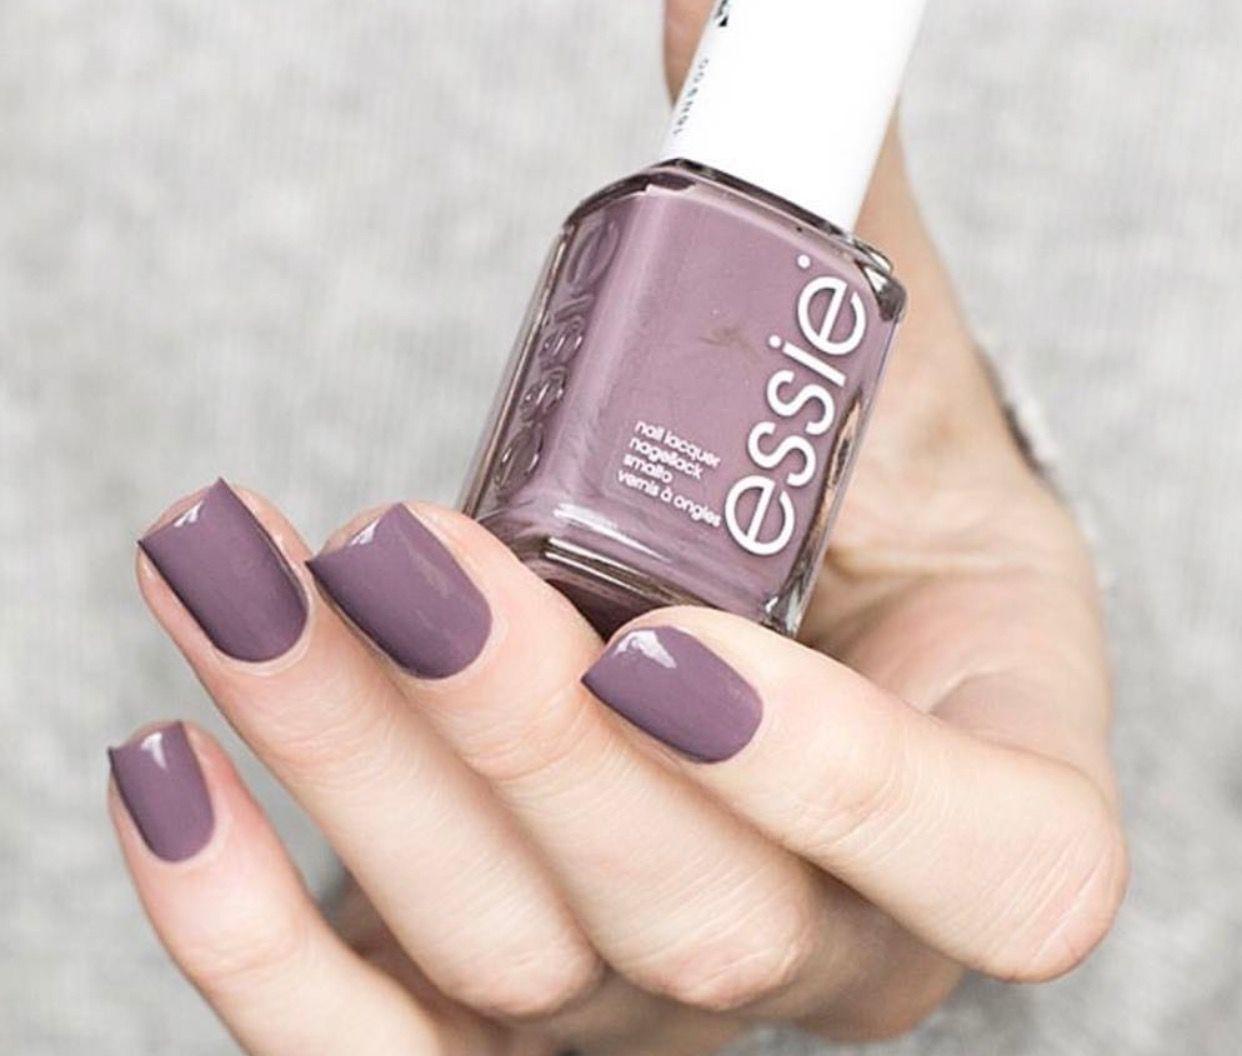 Pin by Yomna Mostafa on nail polish | Pinterest | Skin makeup, Mani ...